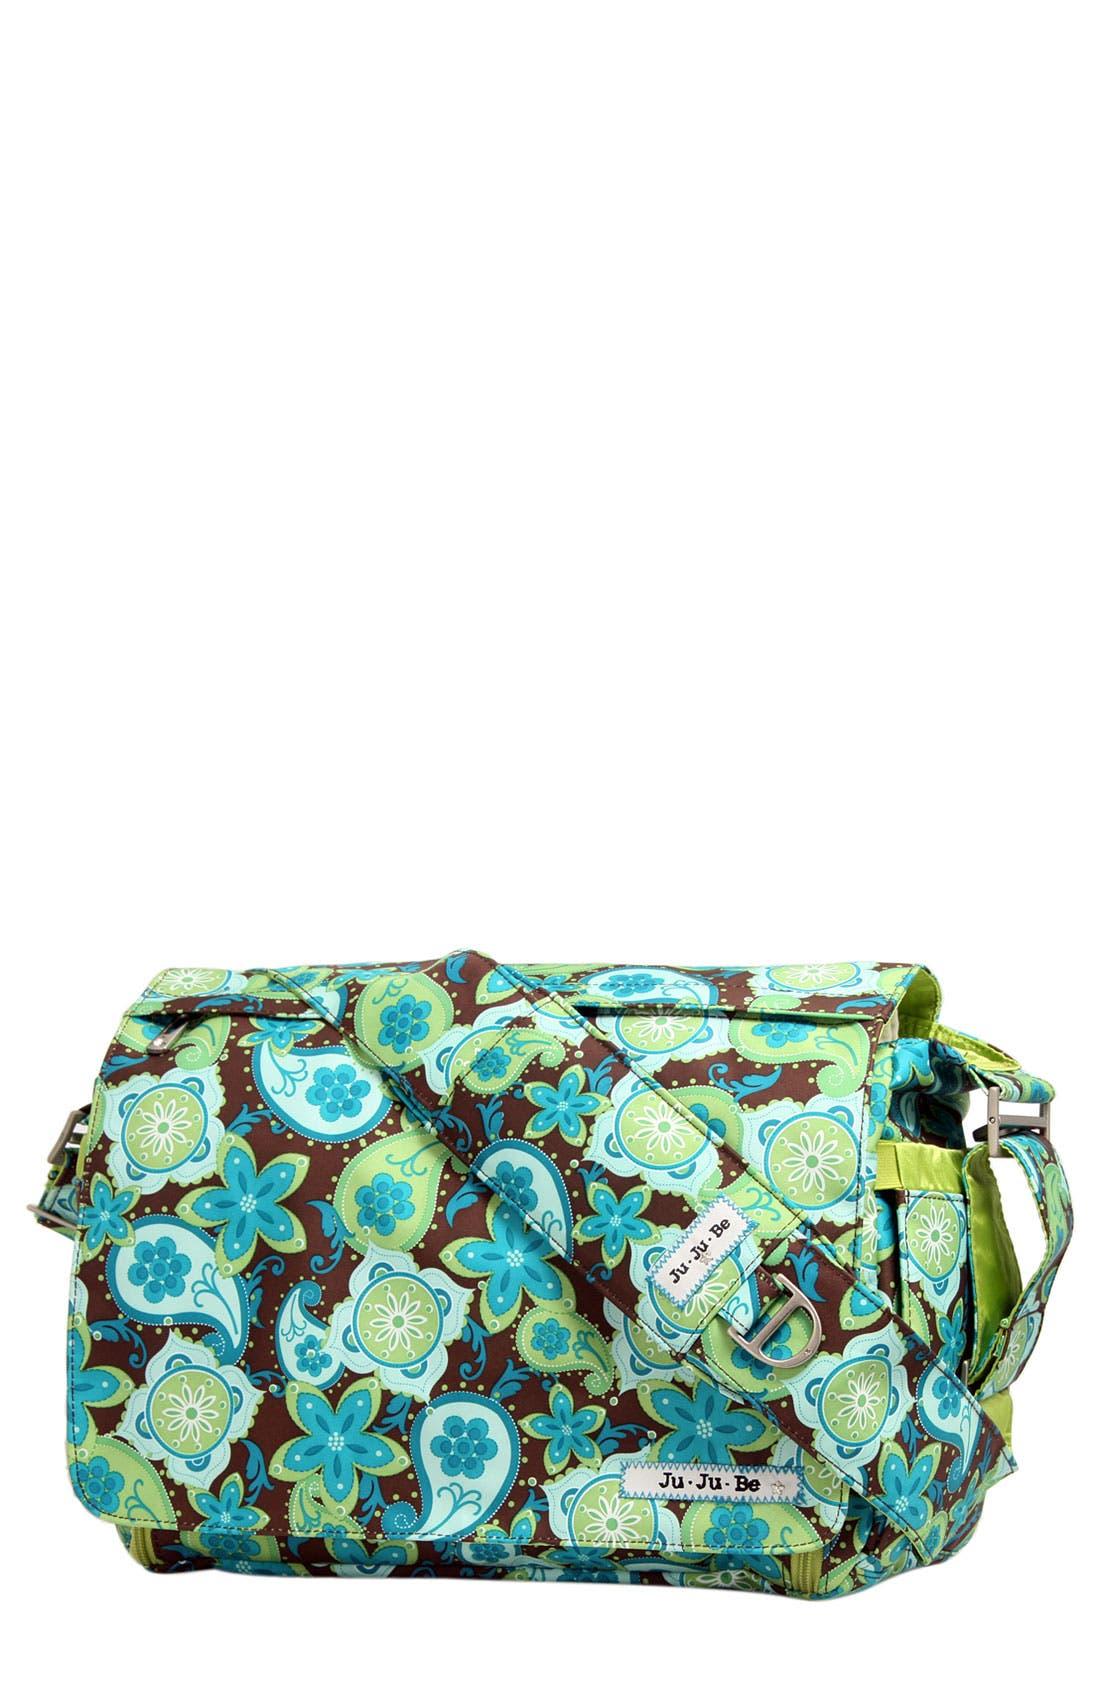 'Be All' Diaper Bag,                             Main thumbnail 1, color,                             Drip Drops